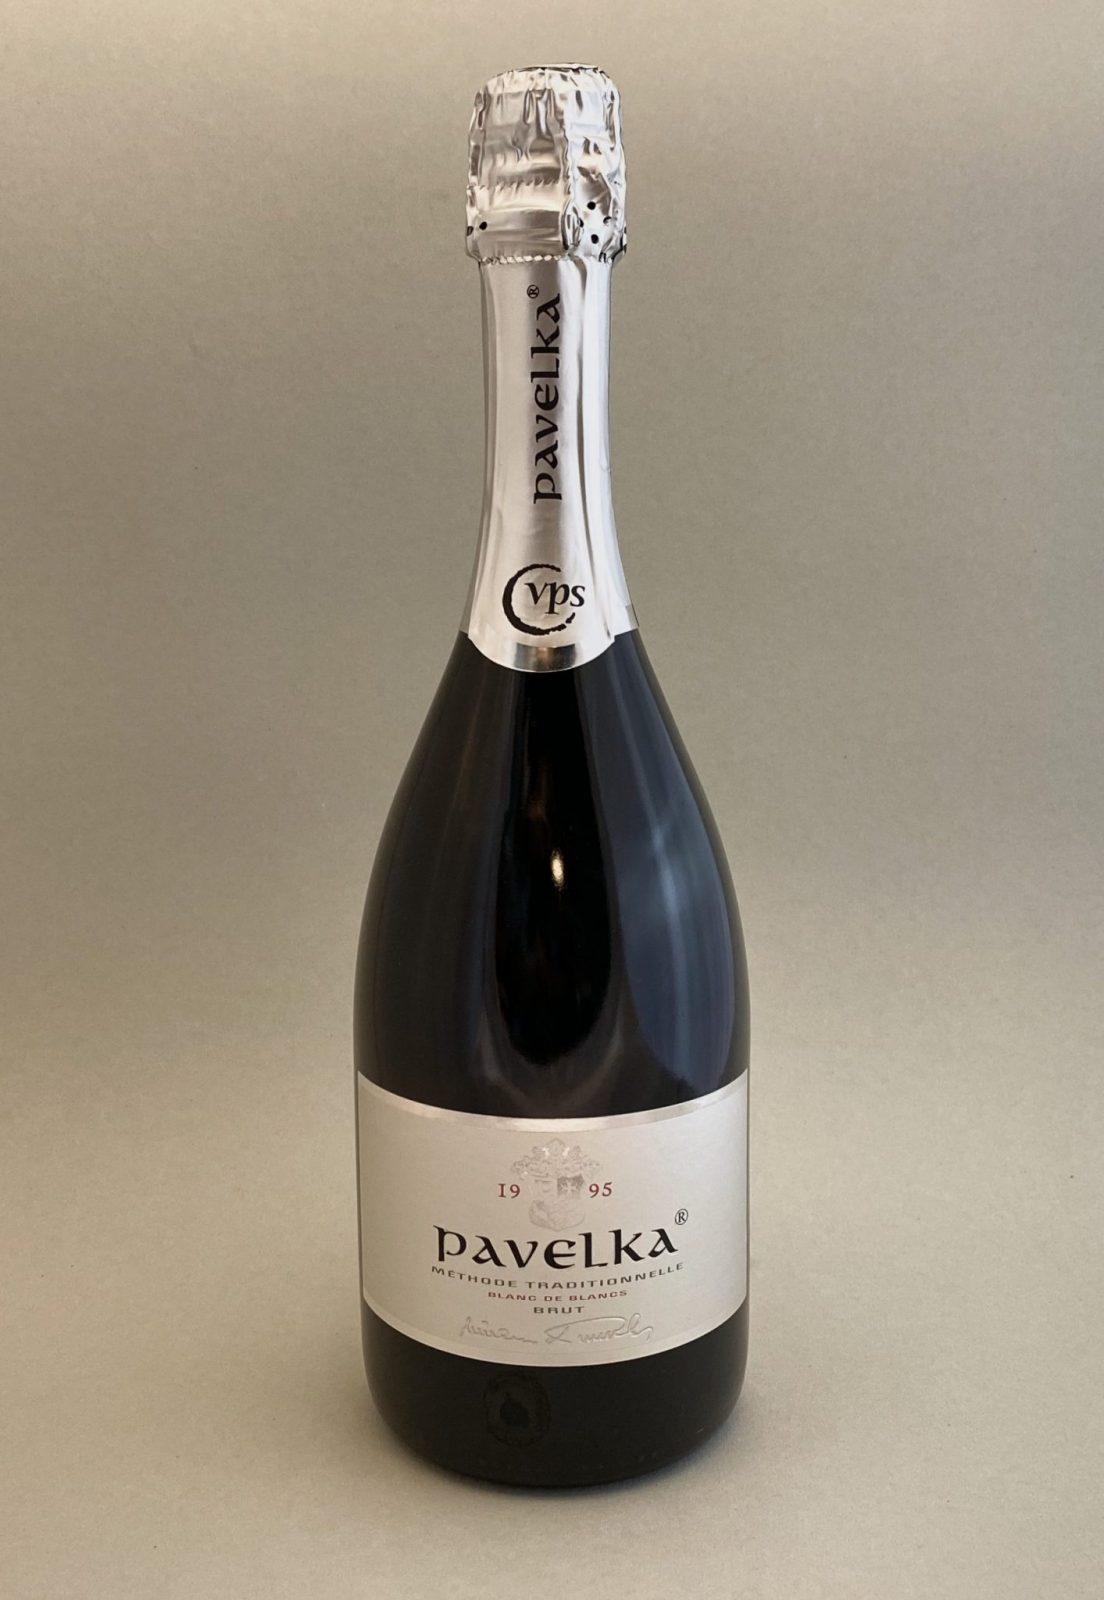 PAVELKA Blanc De Blancs, Bulbinkove vino, vinotéka Bratislava Slnecnice, Sunnywines, rozvoz vina, winebar